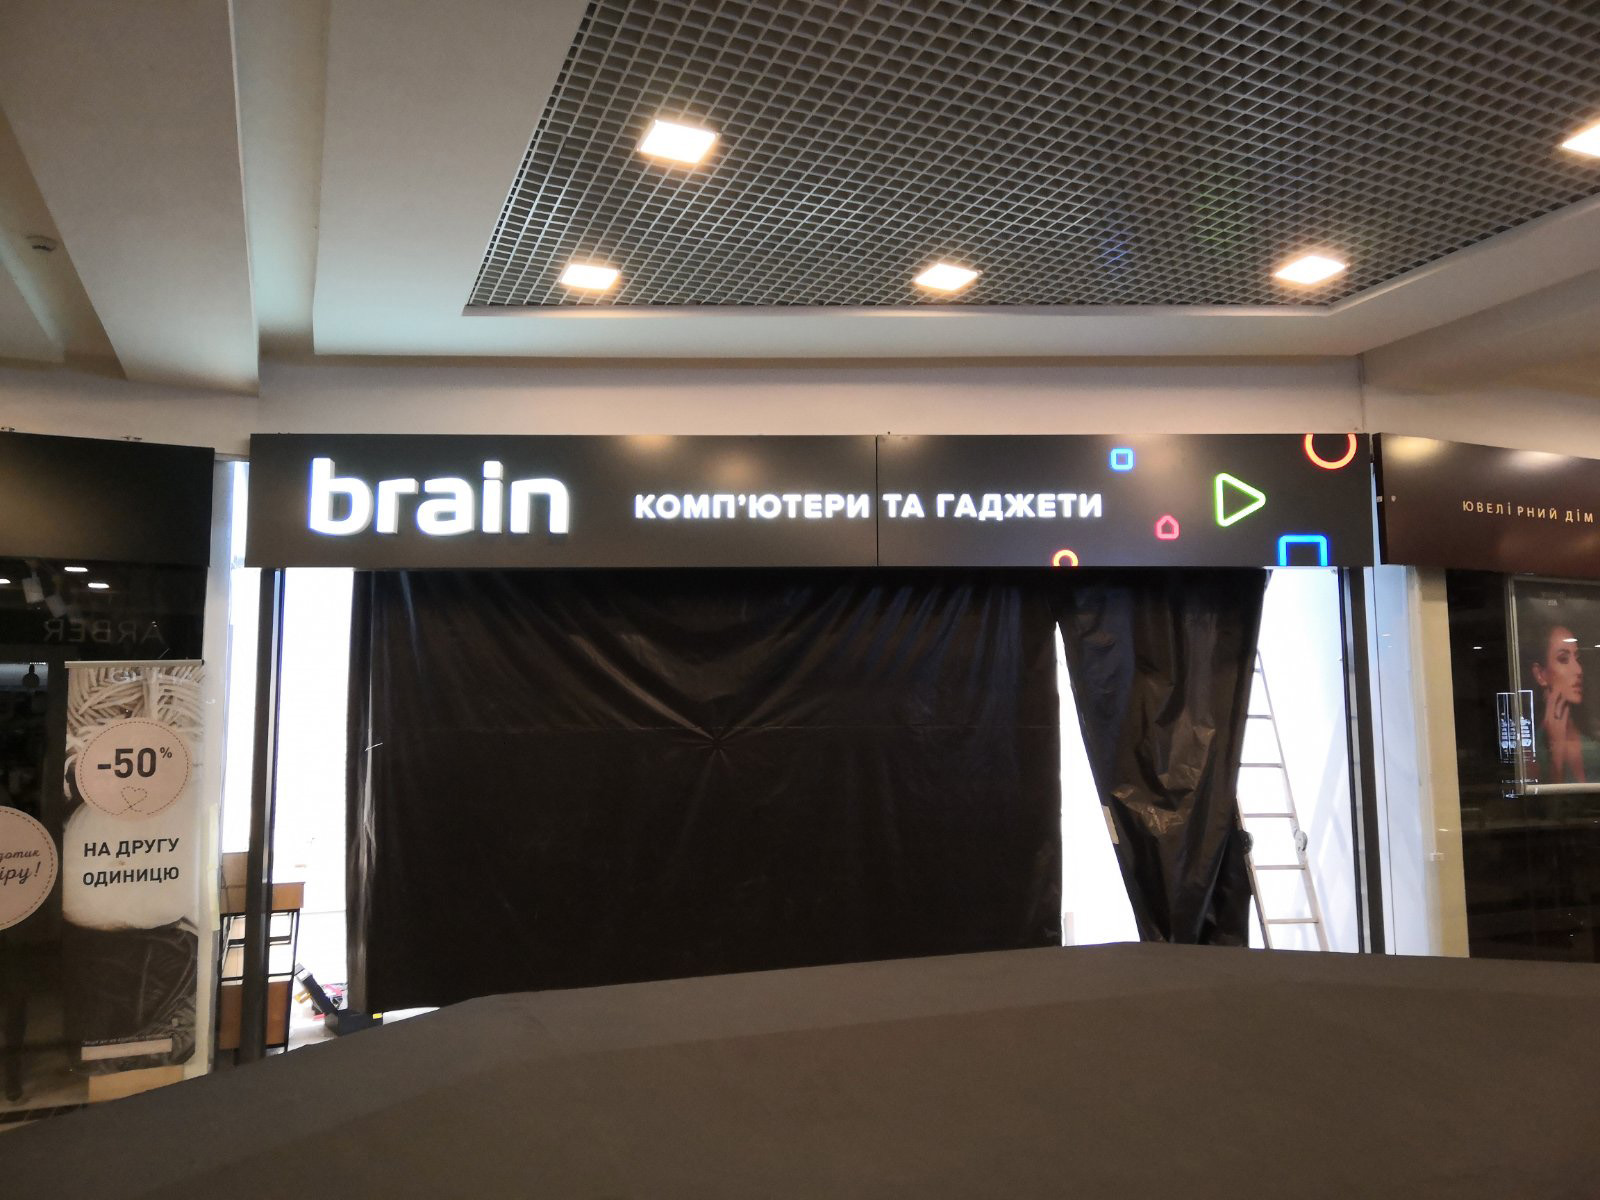 Вывеска для торгового центра французский бульвар Brain